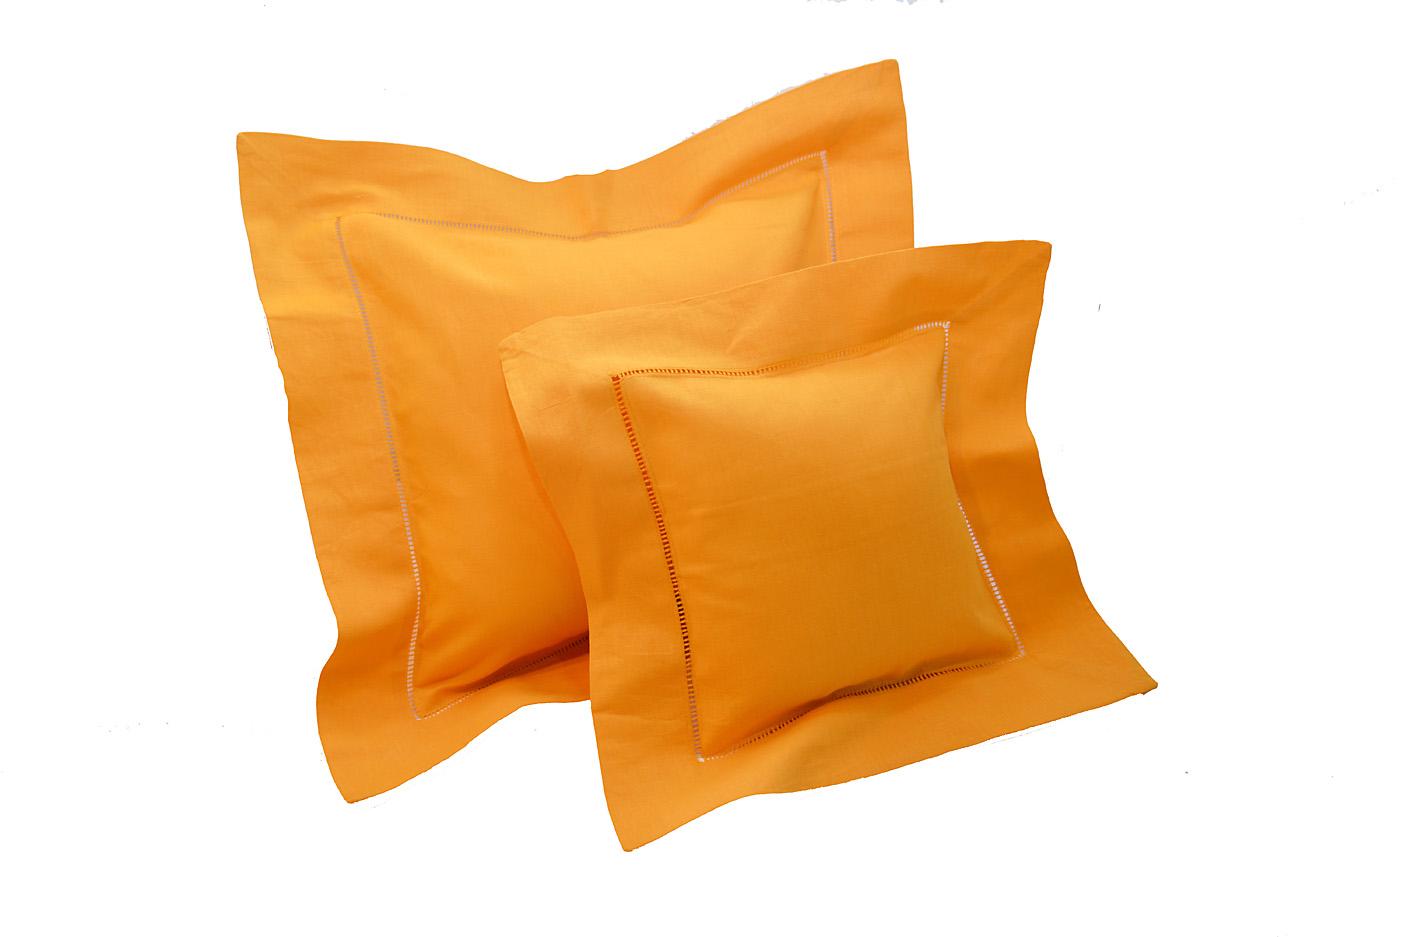 Mandarin Orange colored baby pillows